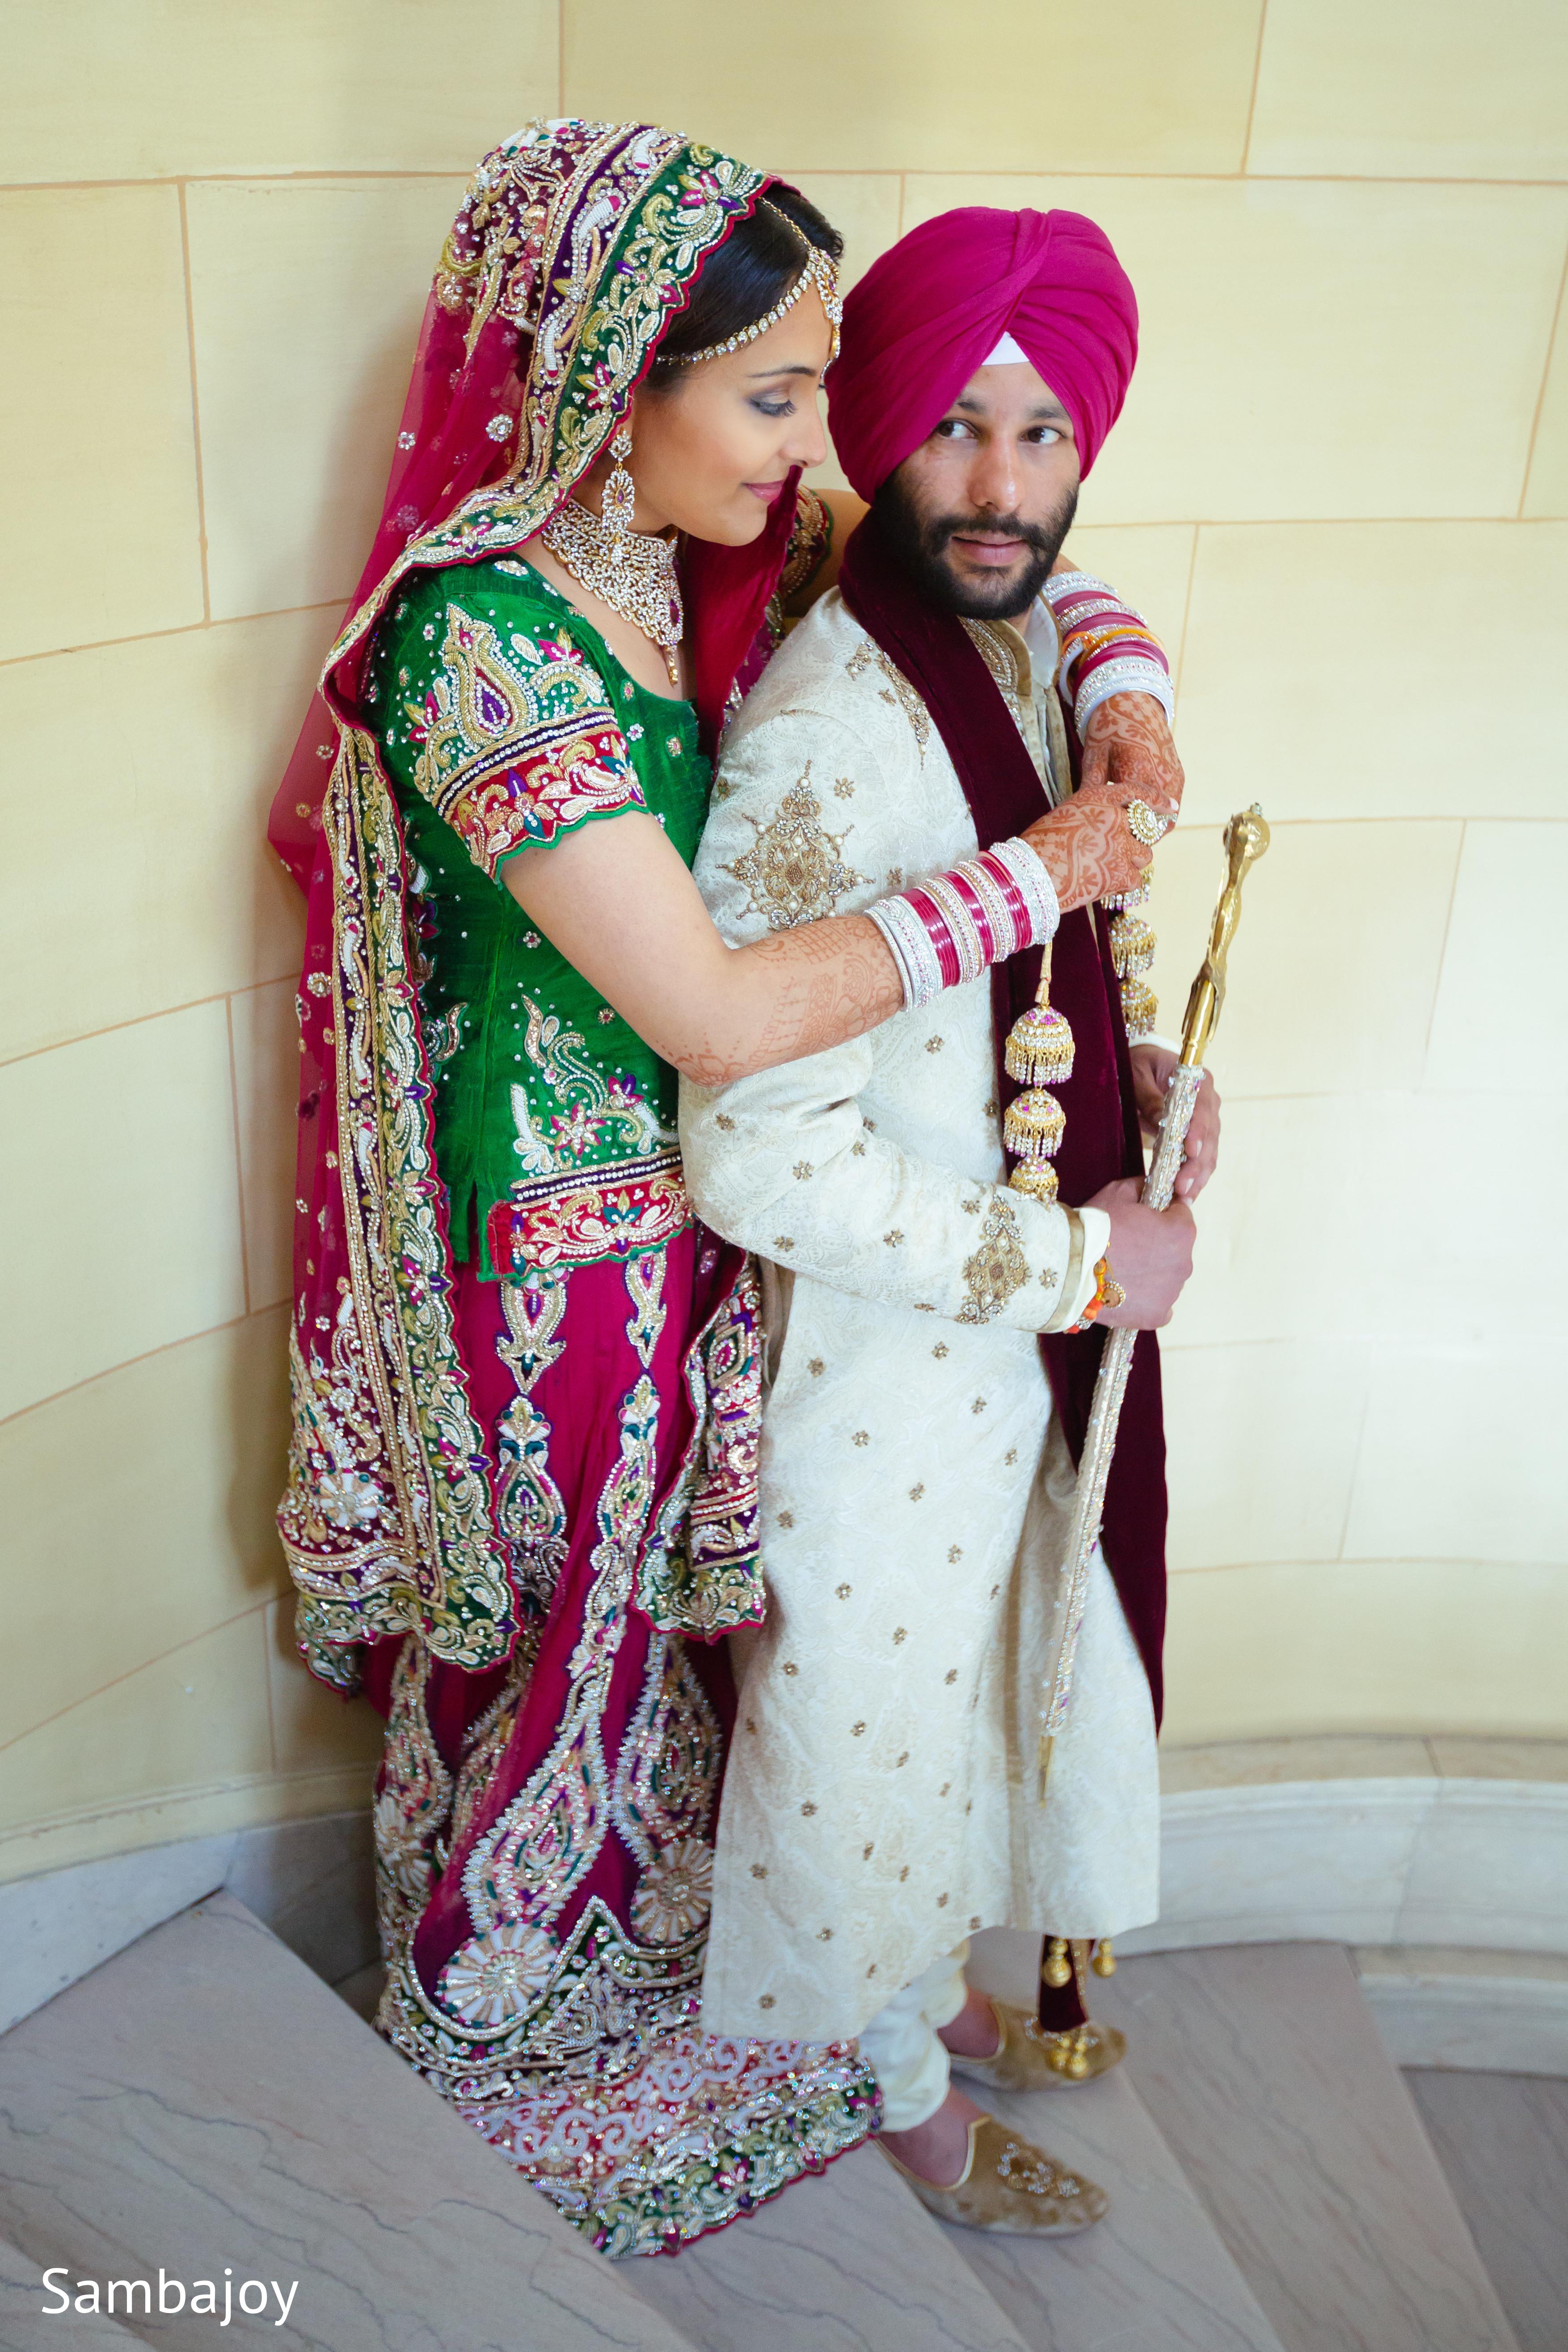 Punjabi Wedding Photography Poses Bride And Groom Wedding Photography Poses